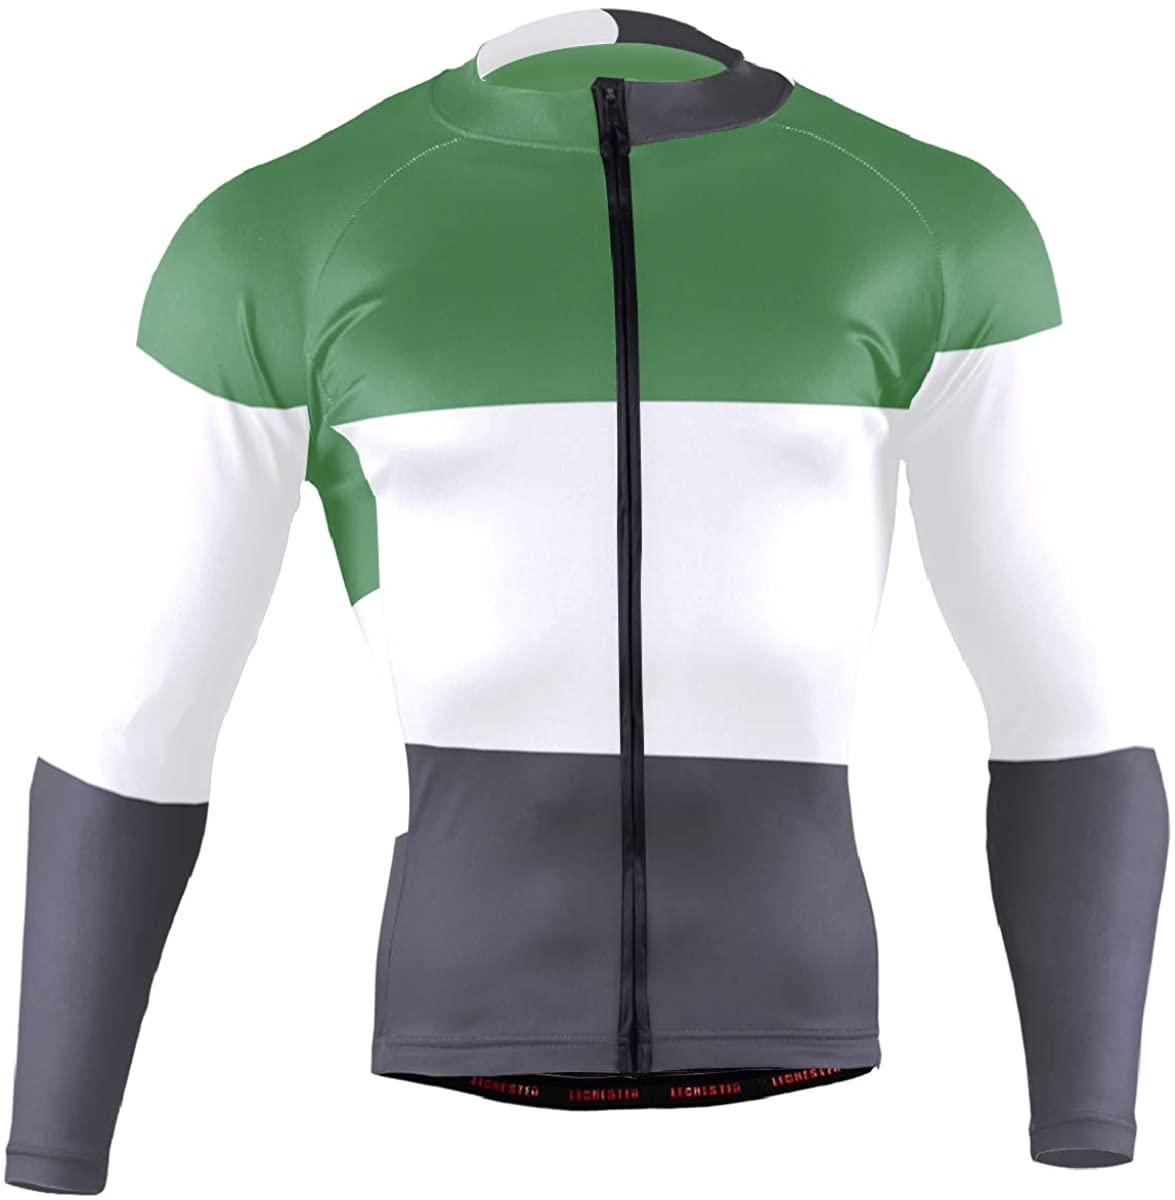 Palestine Flag Men's Cycling Jersey Long Sleeve Bike Jacket Biking Bicycle Jersey Shirt